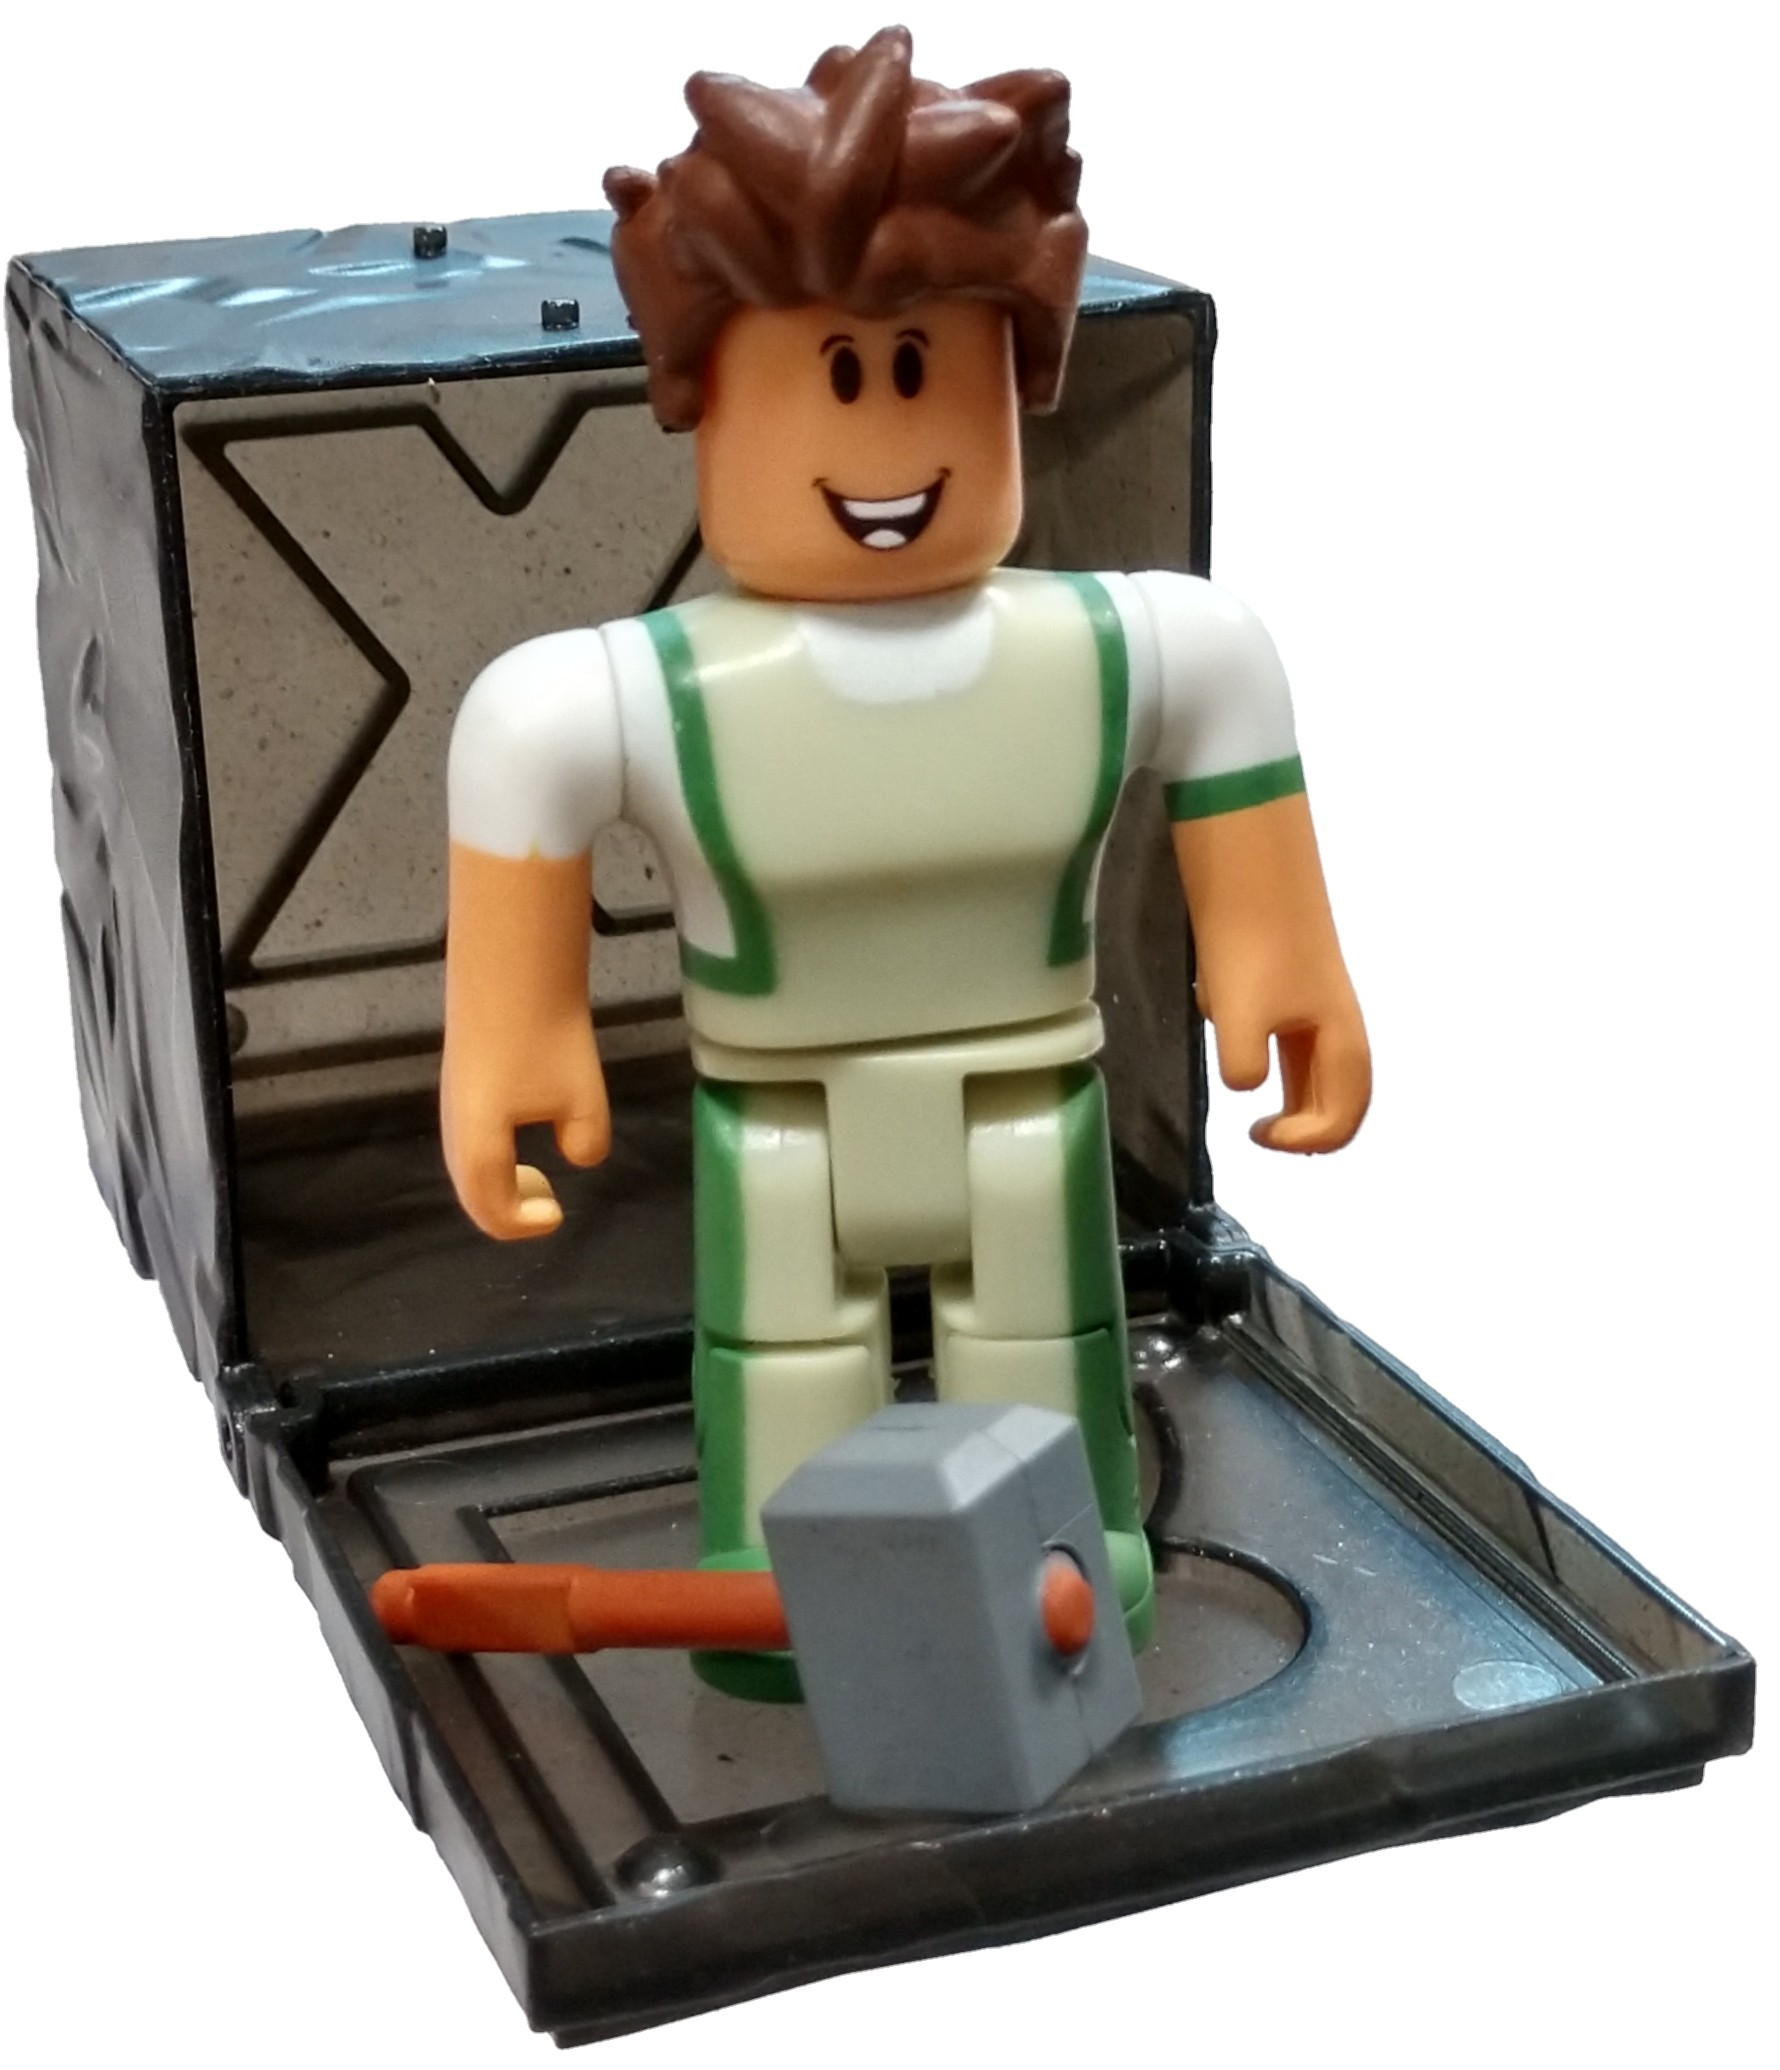 Roblox Series 7 Two Player Kingdom Tycoon Blacksmith Mini Figure